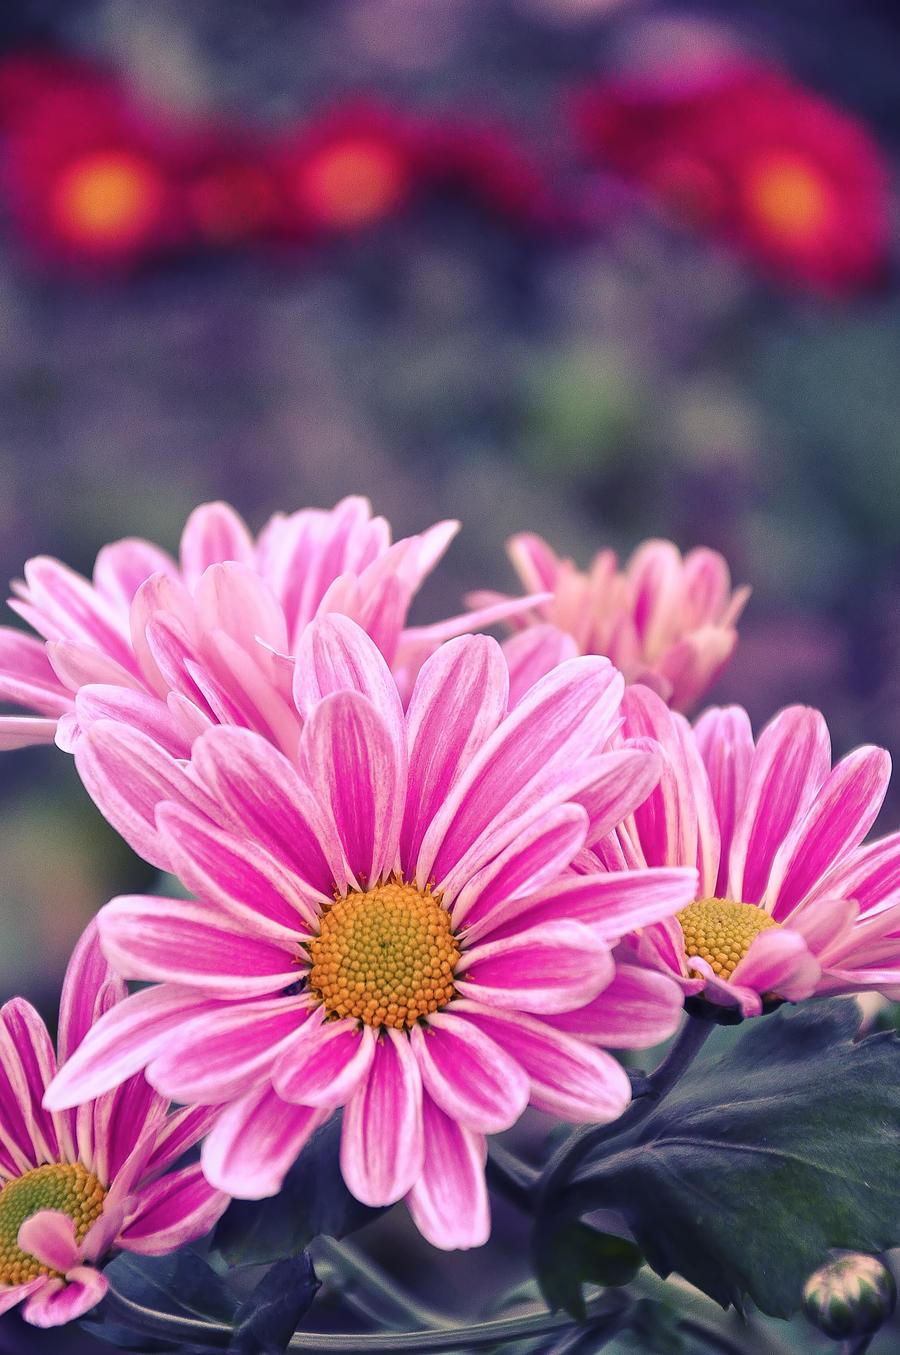 Oh...I feel so pink by Mega-Shots